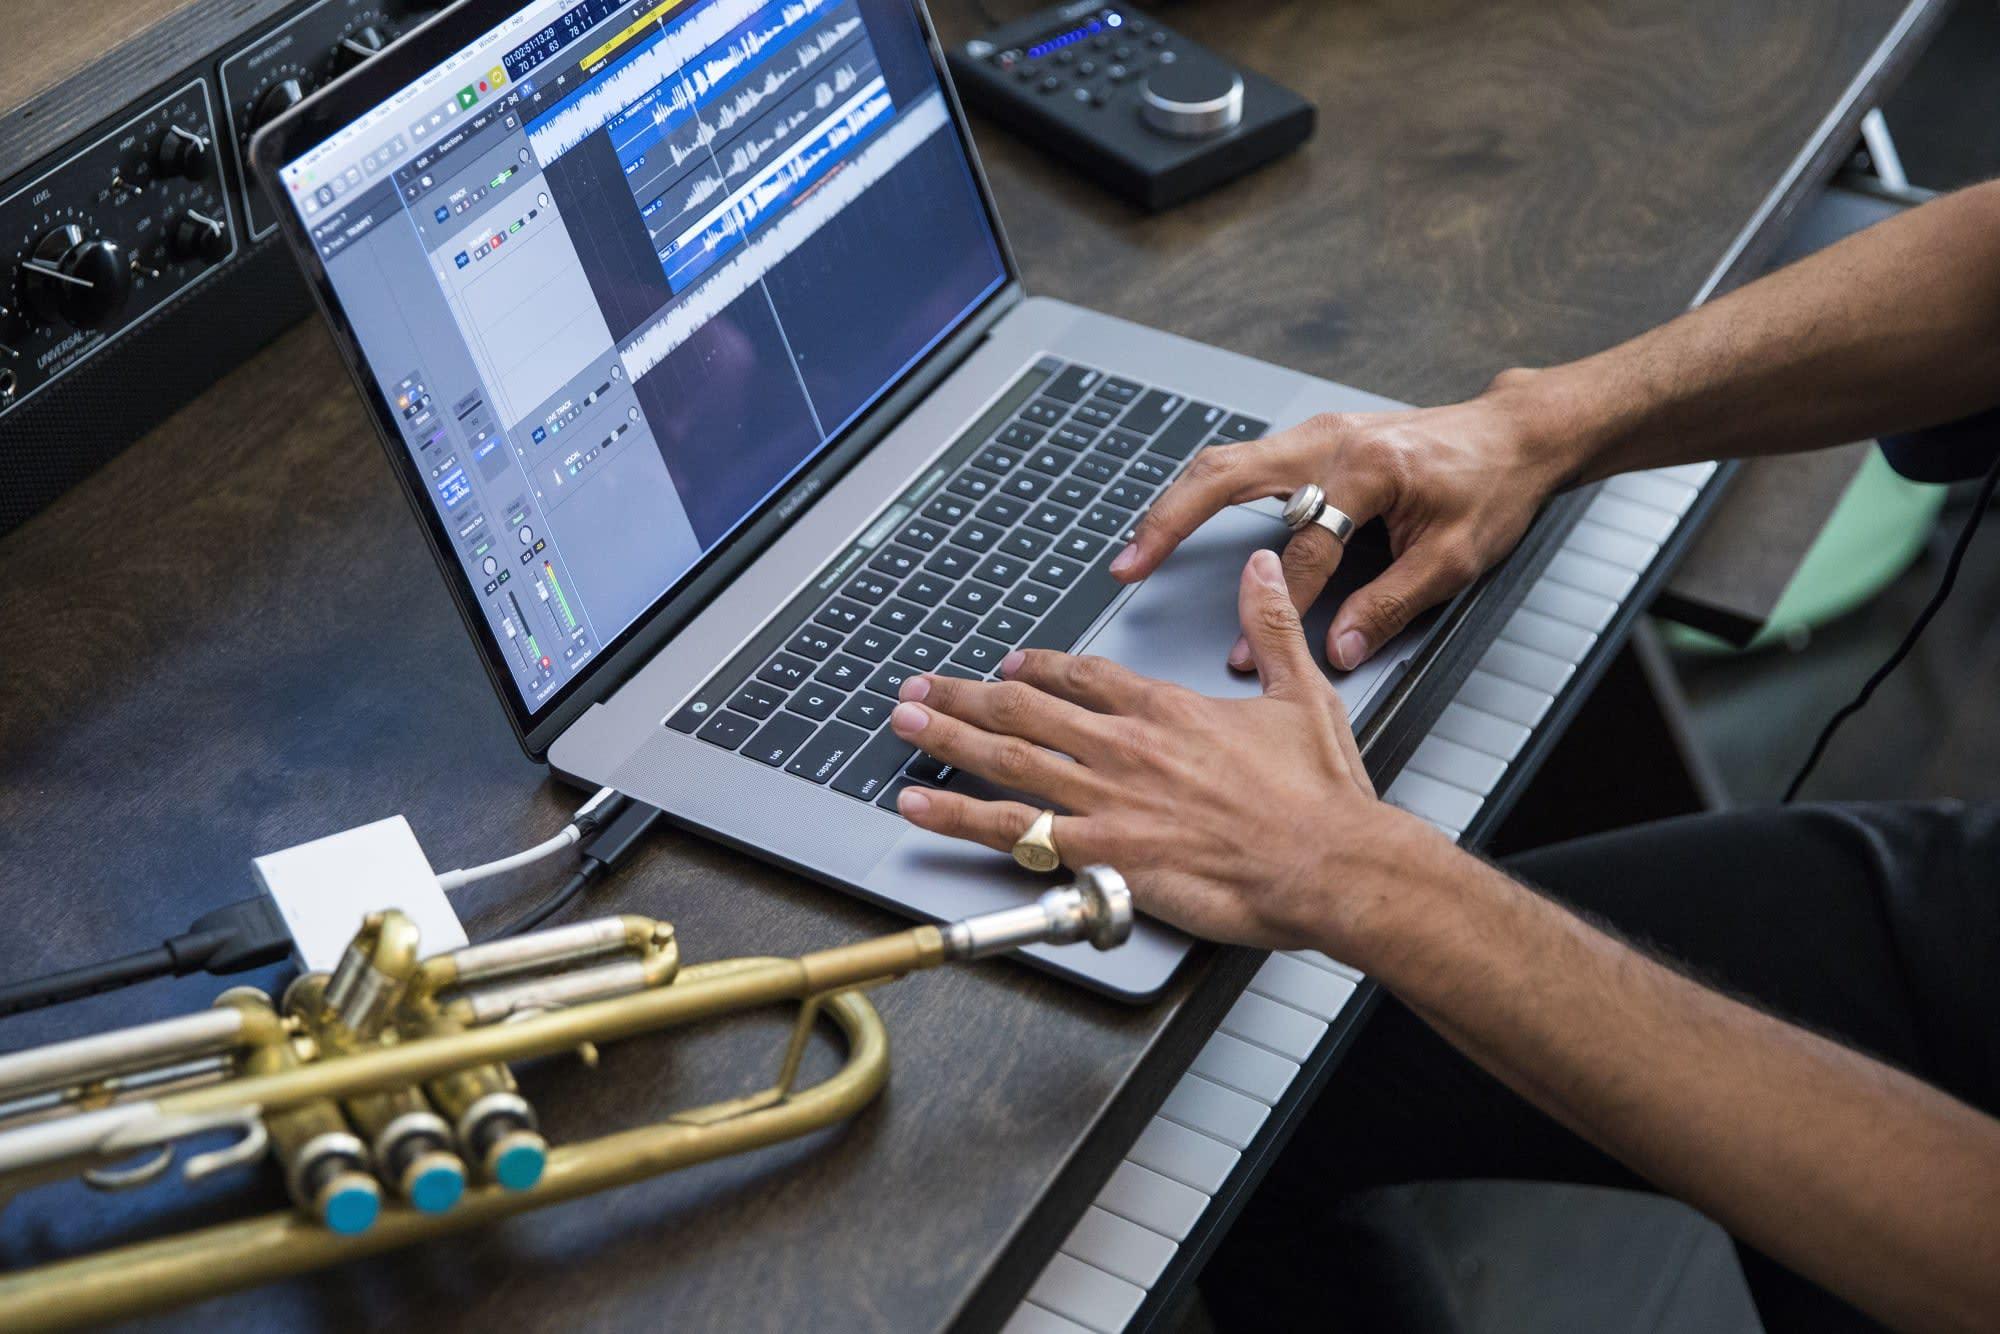 Apple blames software bug for MacBook Pro CPU throttling